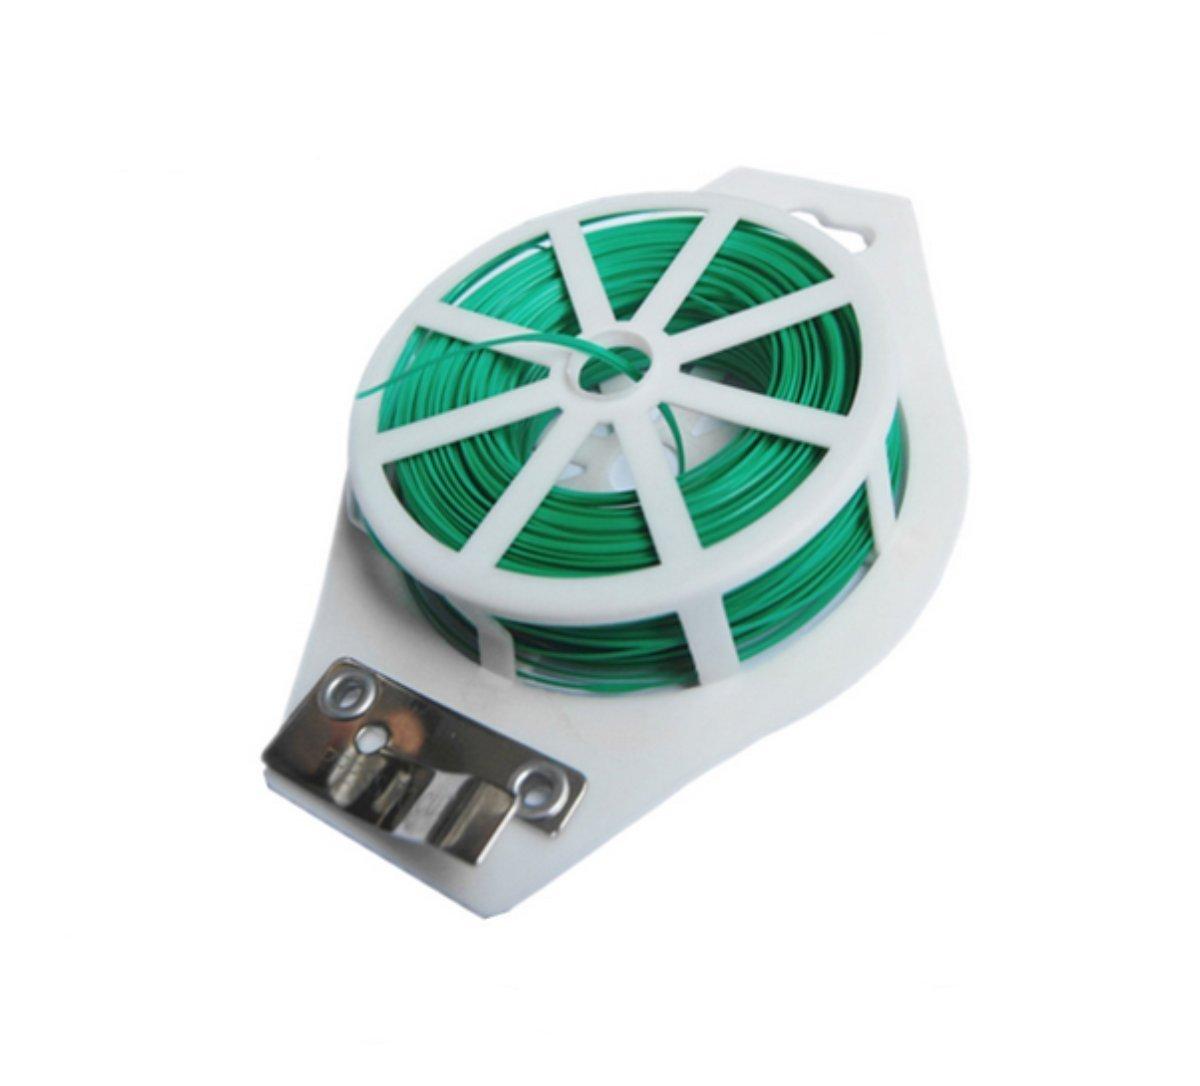 HYINDOOR 164ft Plastic Twist Tie Spool roll with Cutter for Garden Yard Plant Green PVC Twist Tie Line YD-TT164